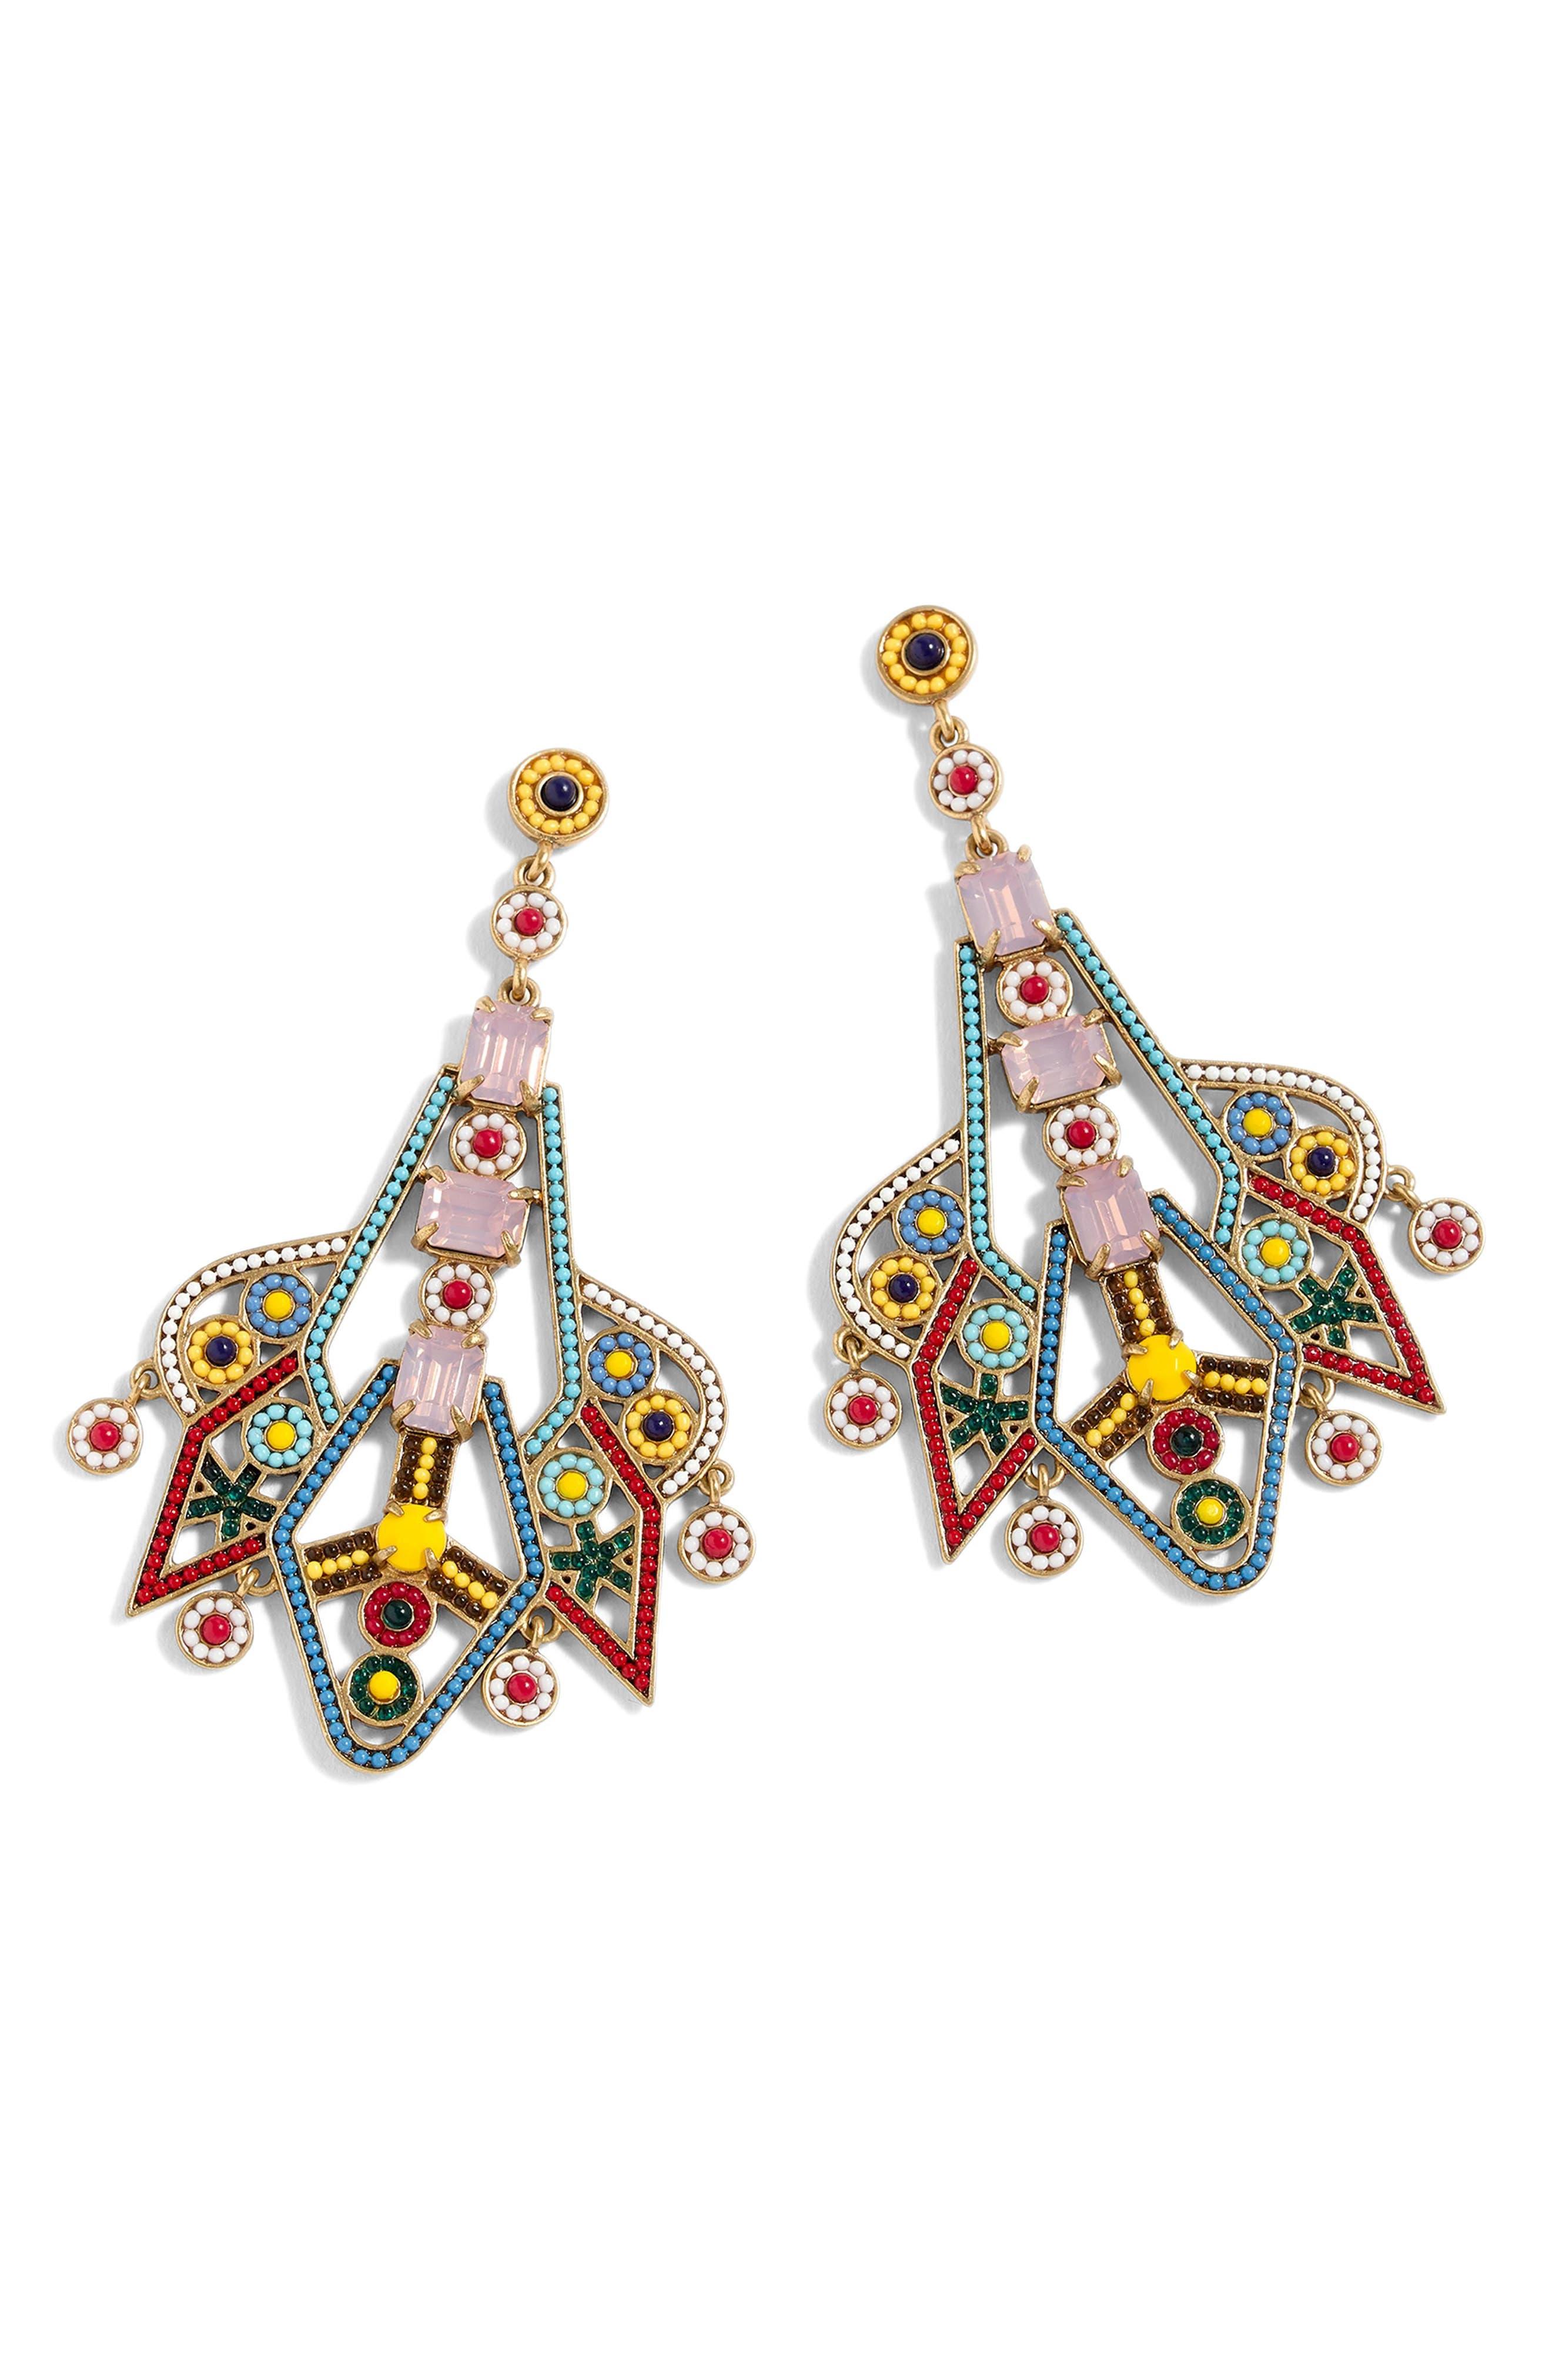 Bead & Stone Drop Earrings,                             Main thumbnail 1, color,                             700